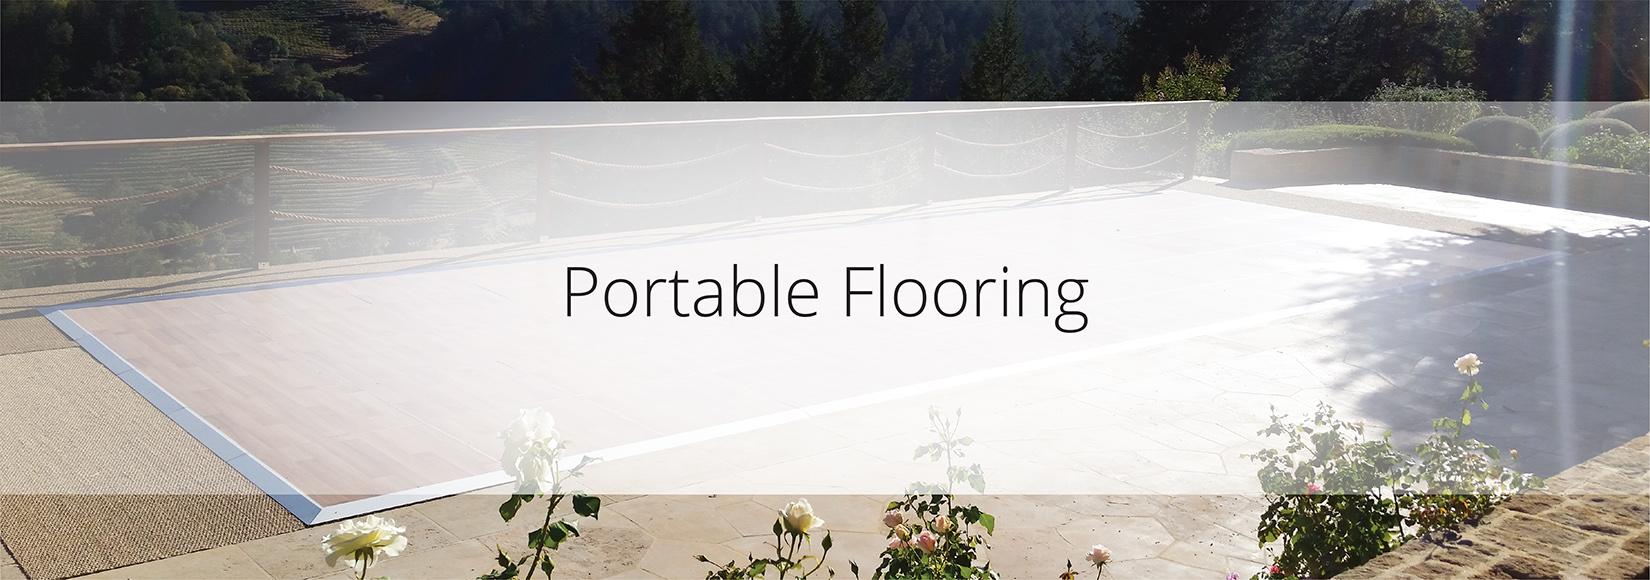 Portable-Flooring